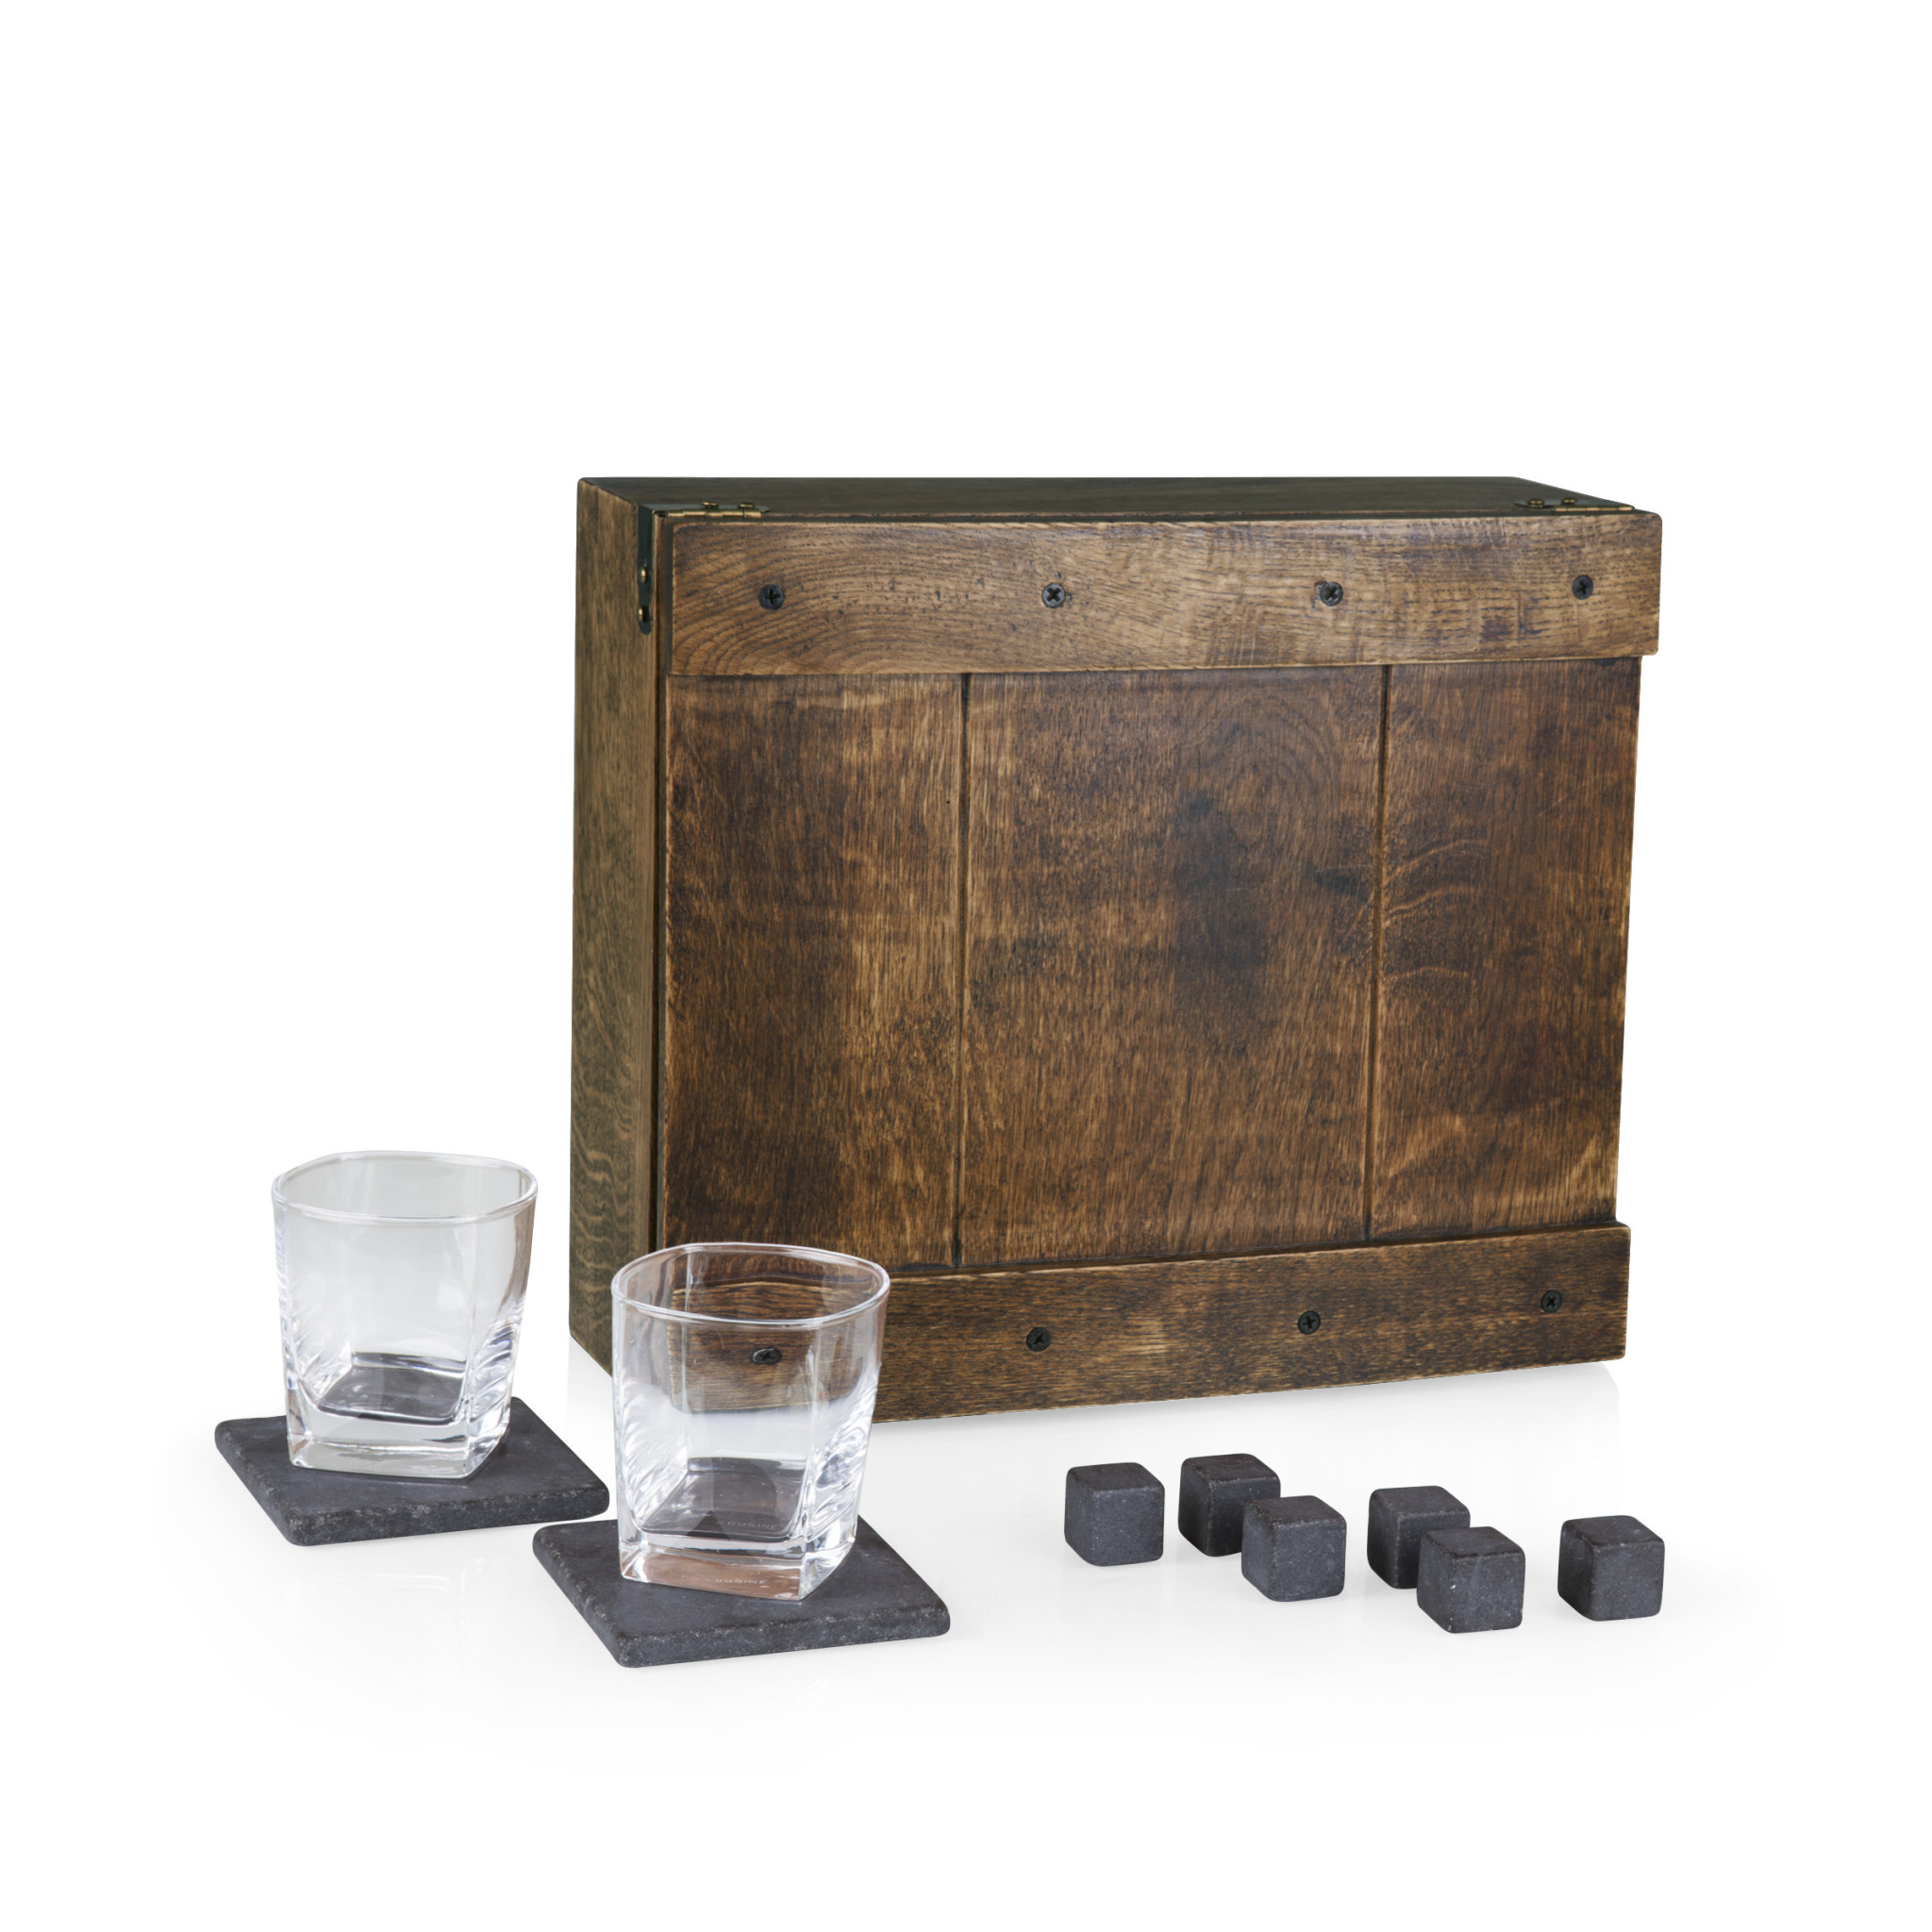 PICNIC-Whiskey Box